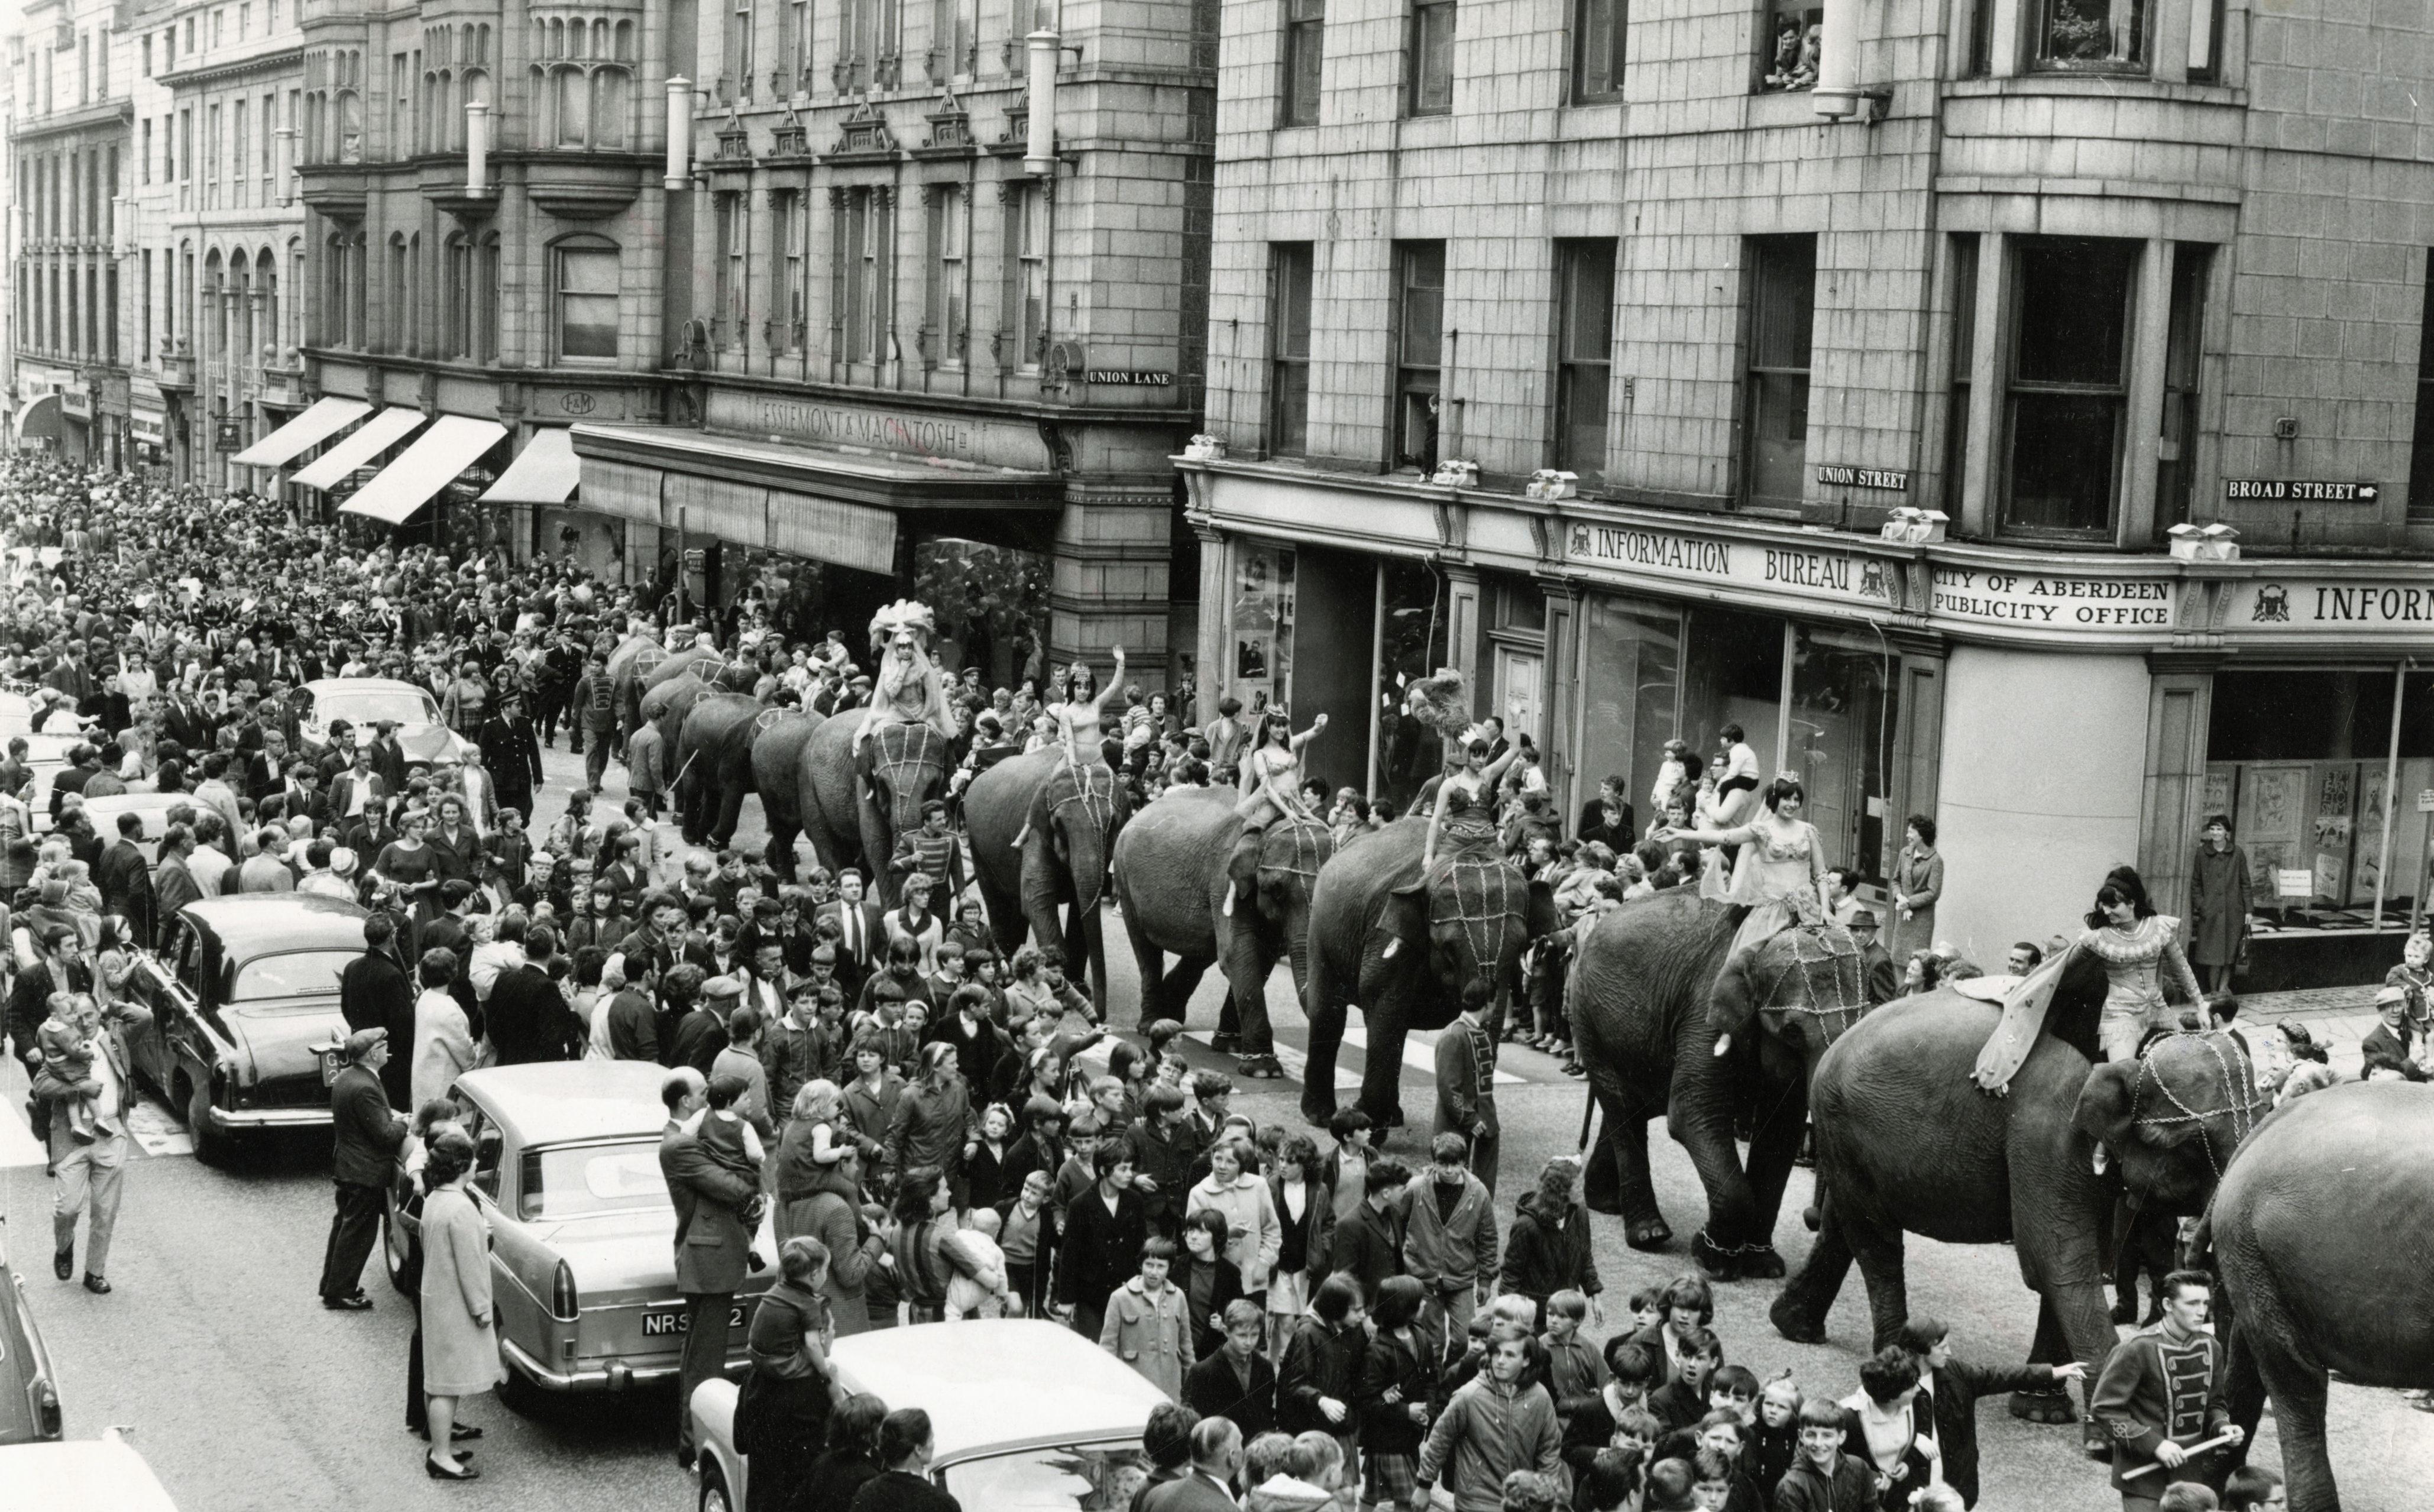 Billy Smart's elephants parade along Union Street